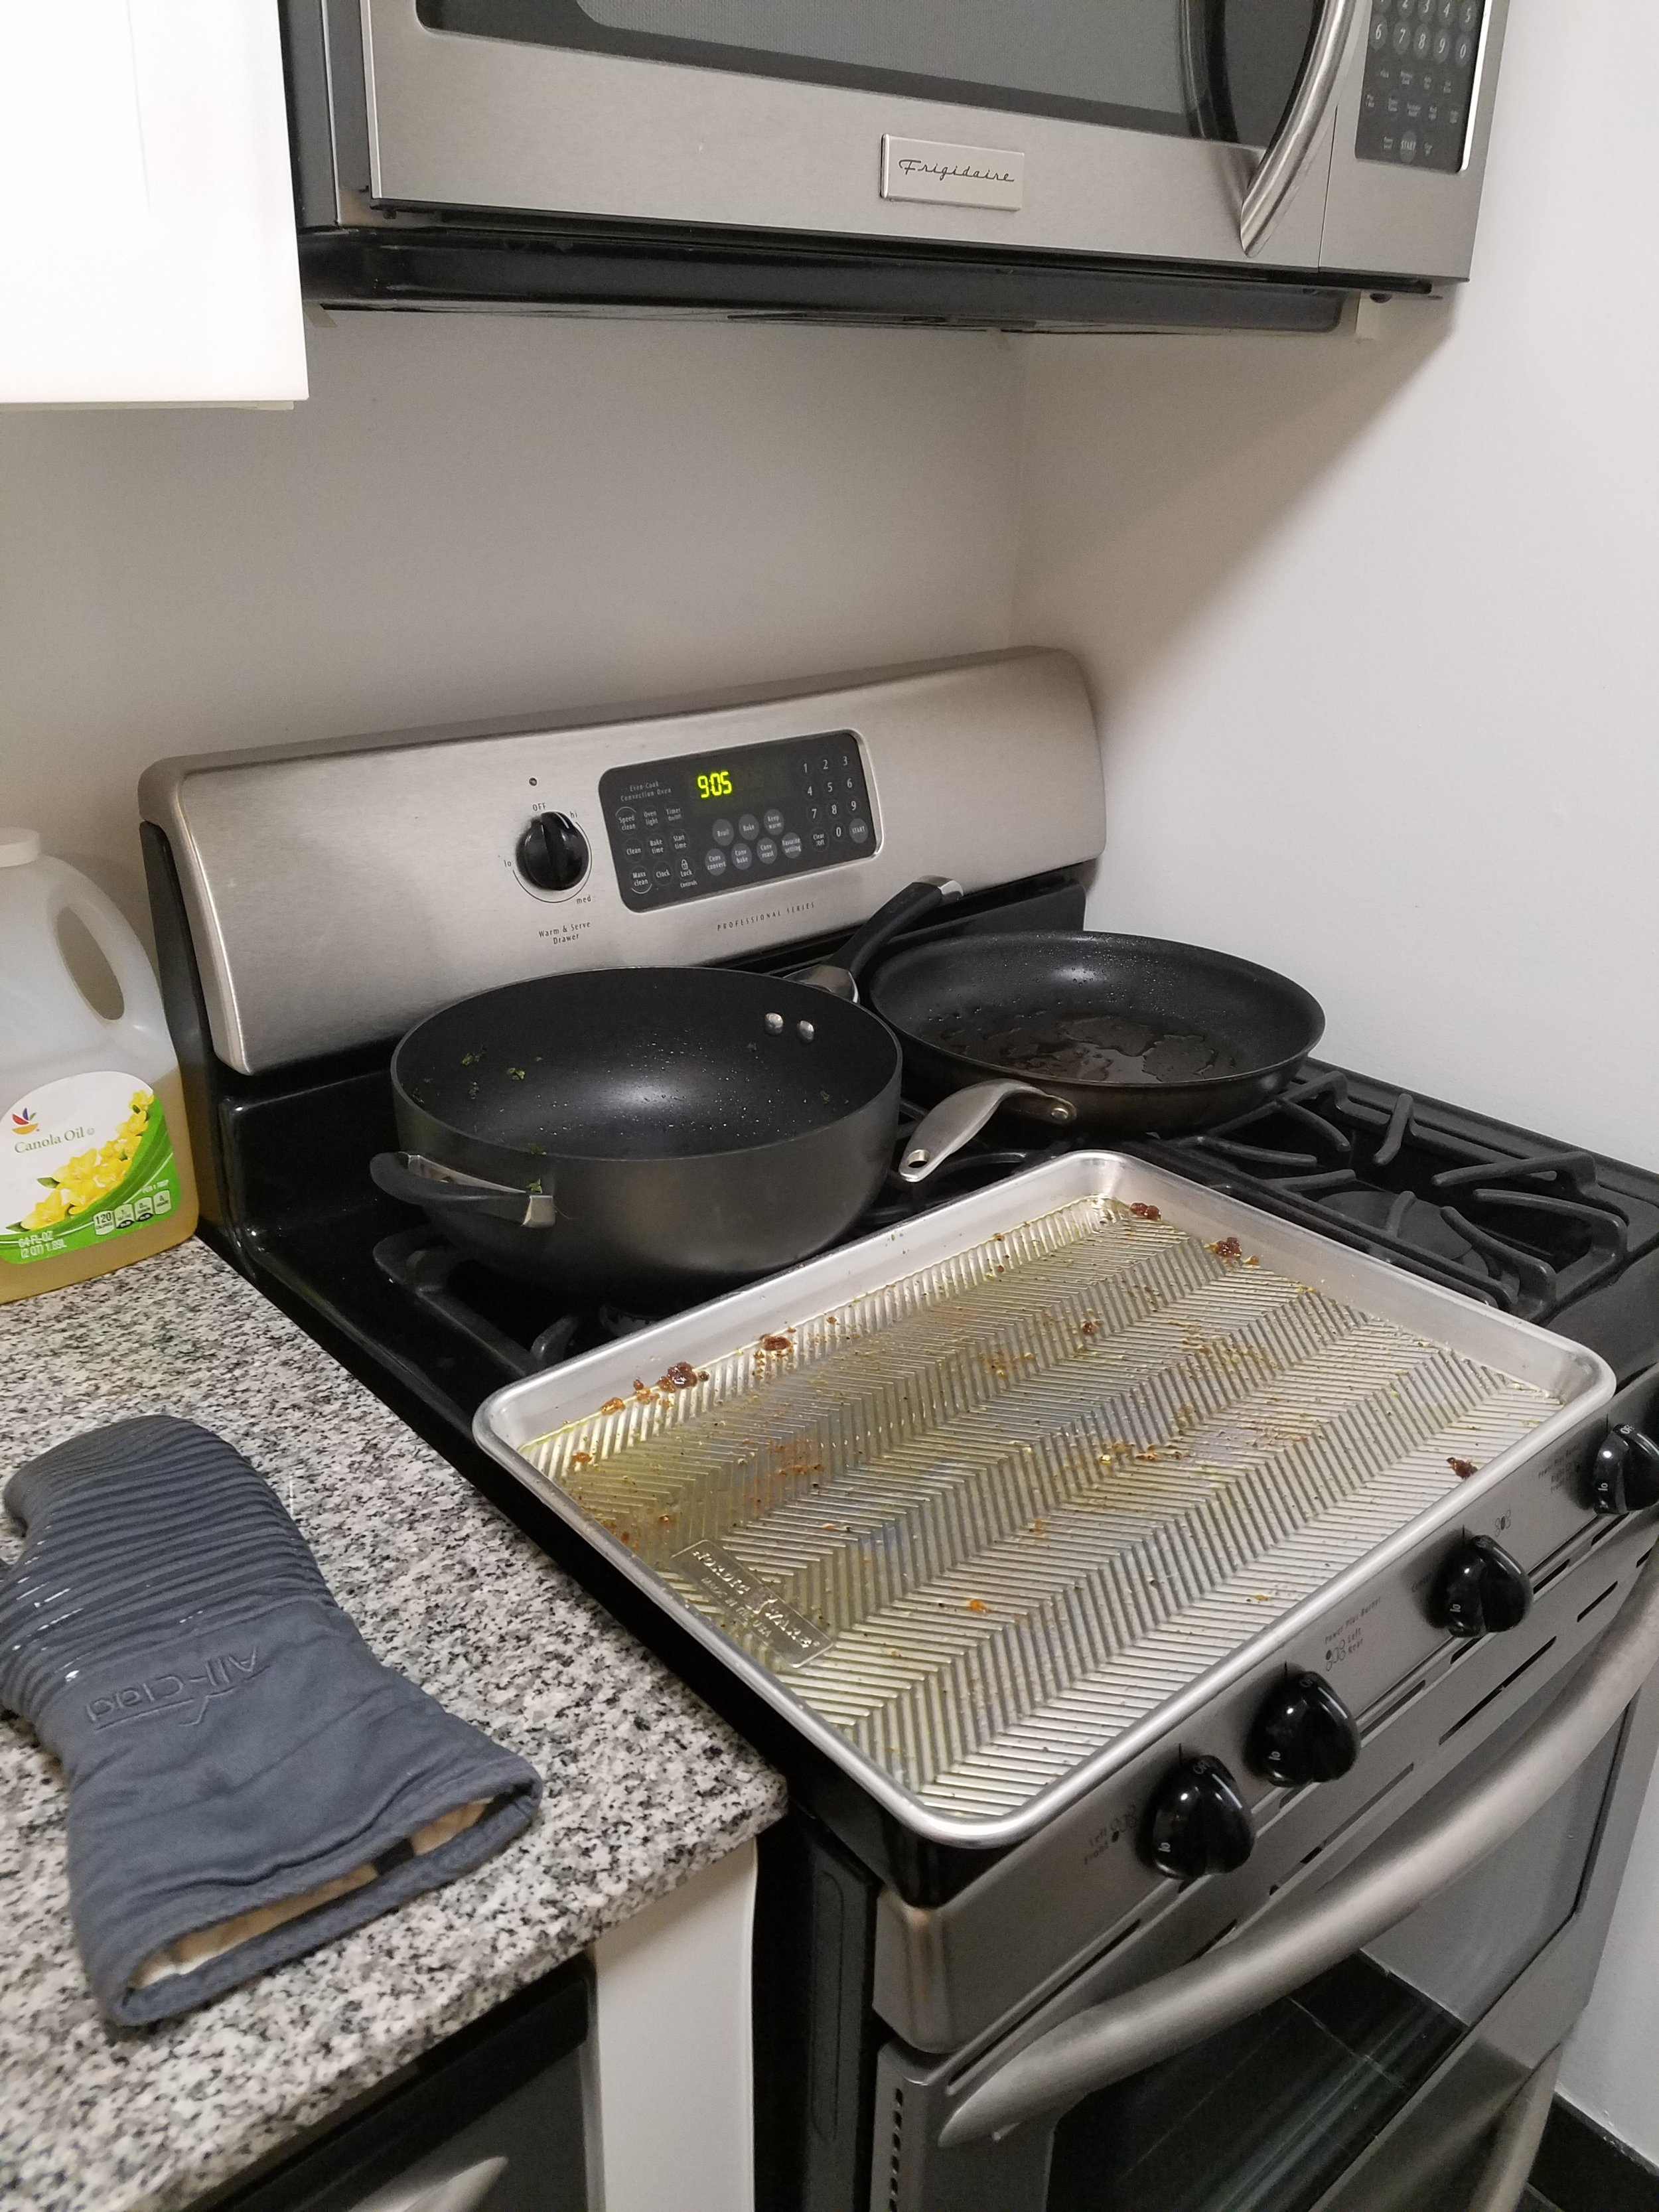 Chef'd Smoky Maple Pork Loin Dirty Dishes.jpg